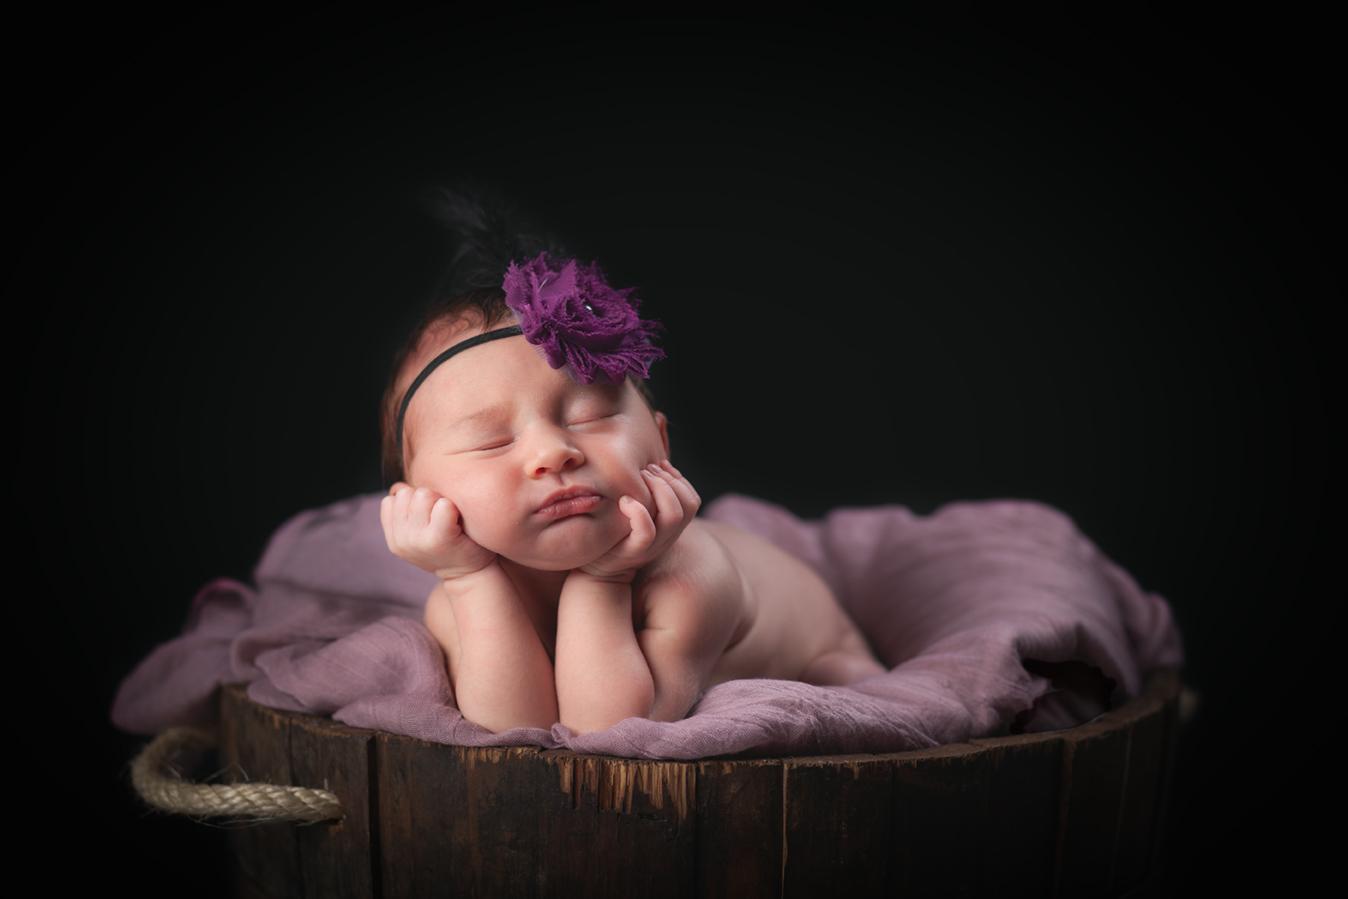 fotografo-recien-nacido-zaragoza